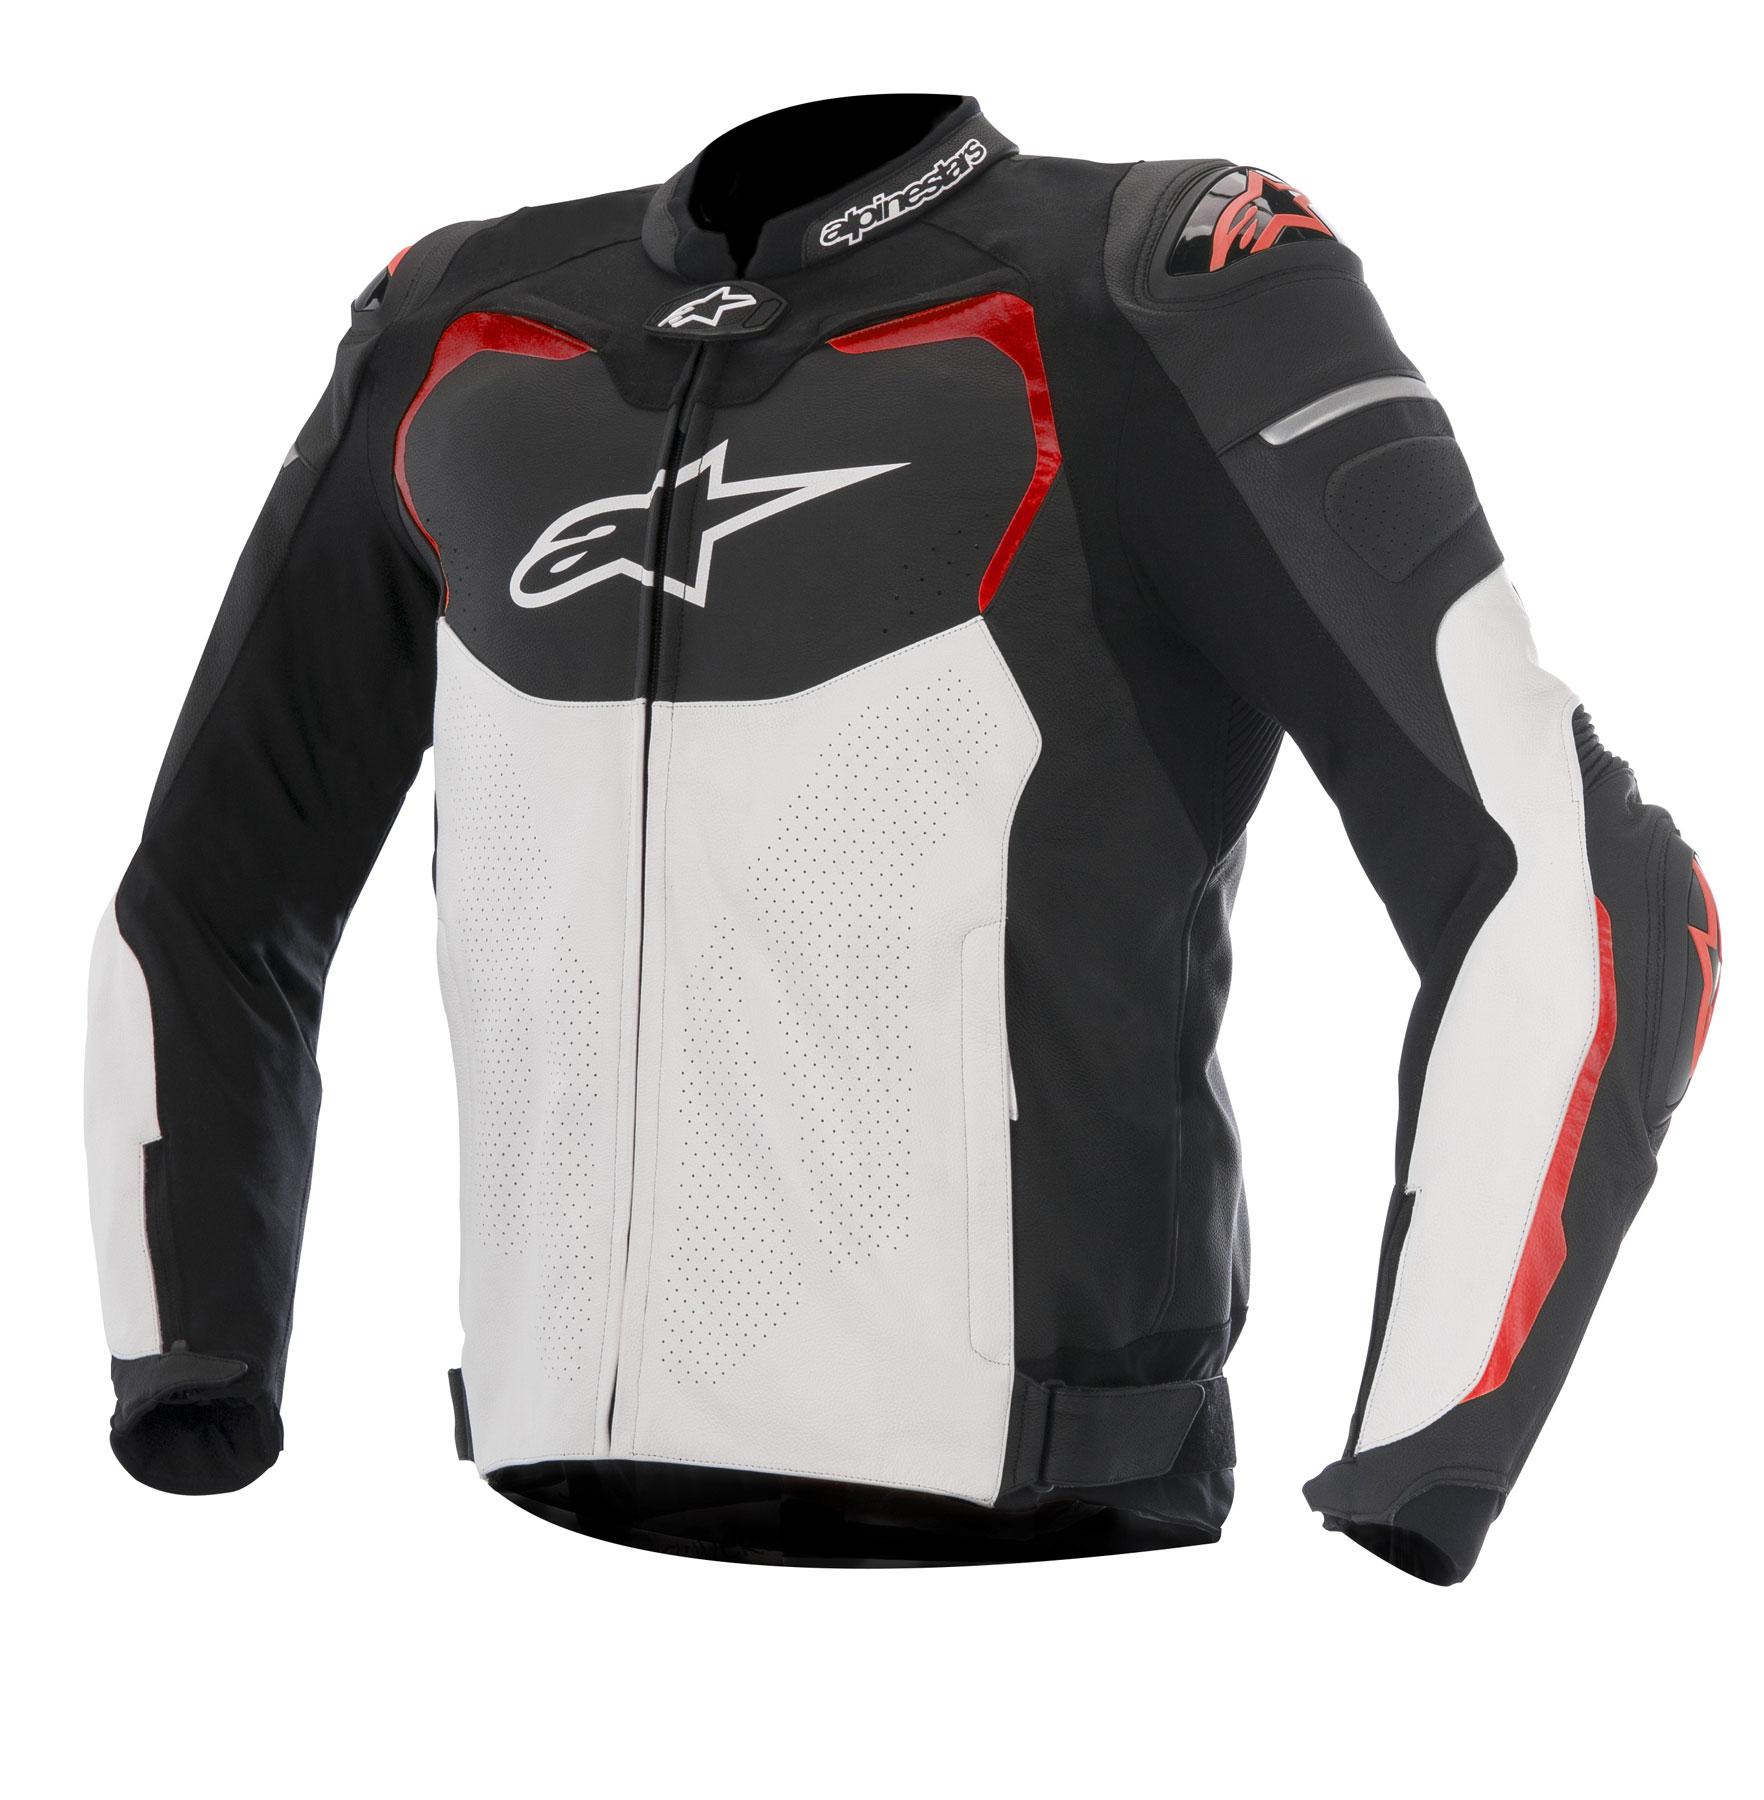 Alpinestars GP PRO AIRFLOW Leather Jacket (Black/White/Red)